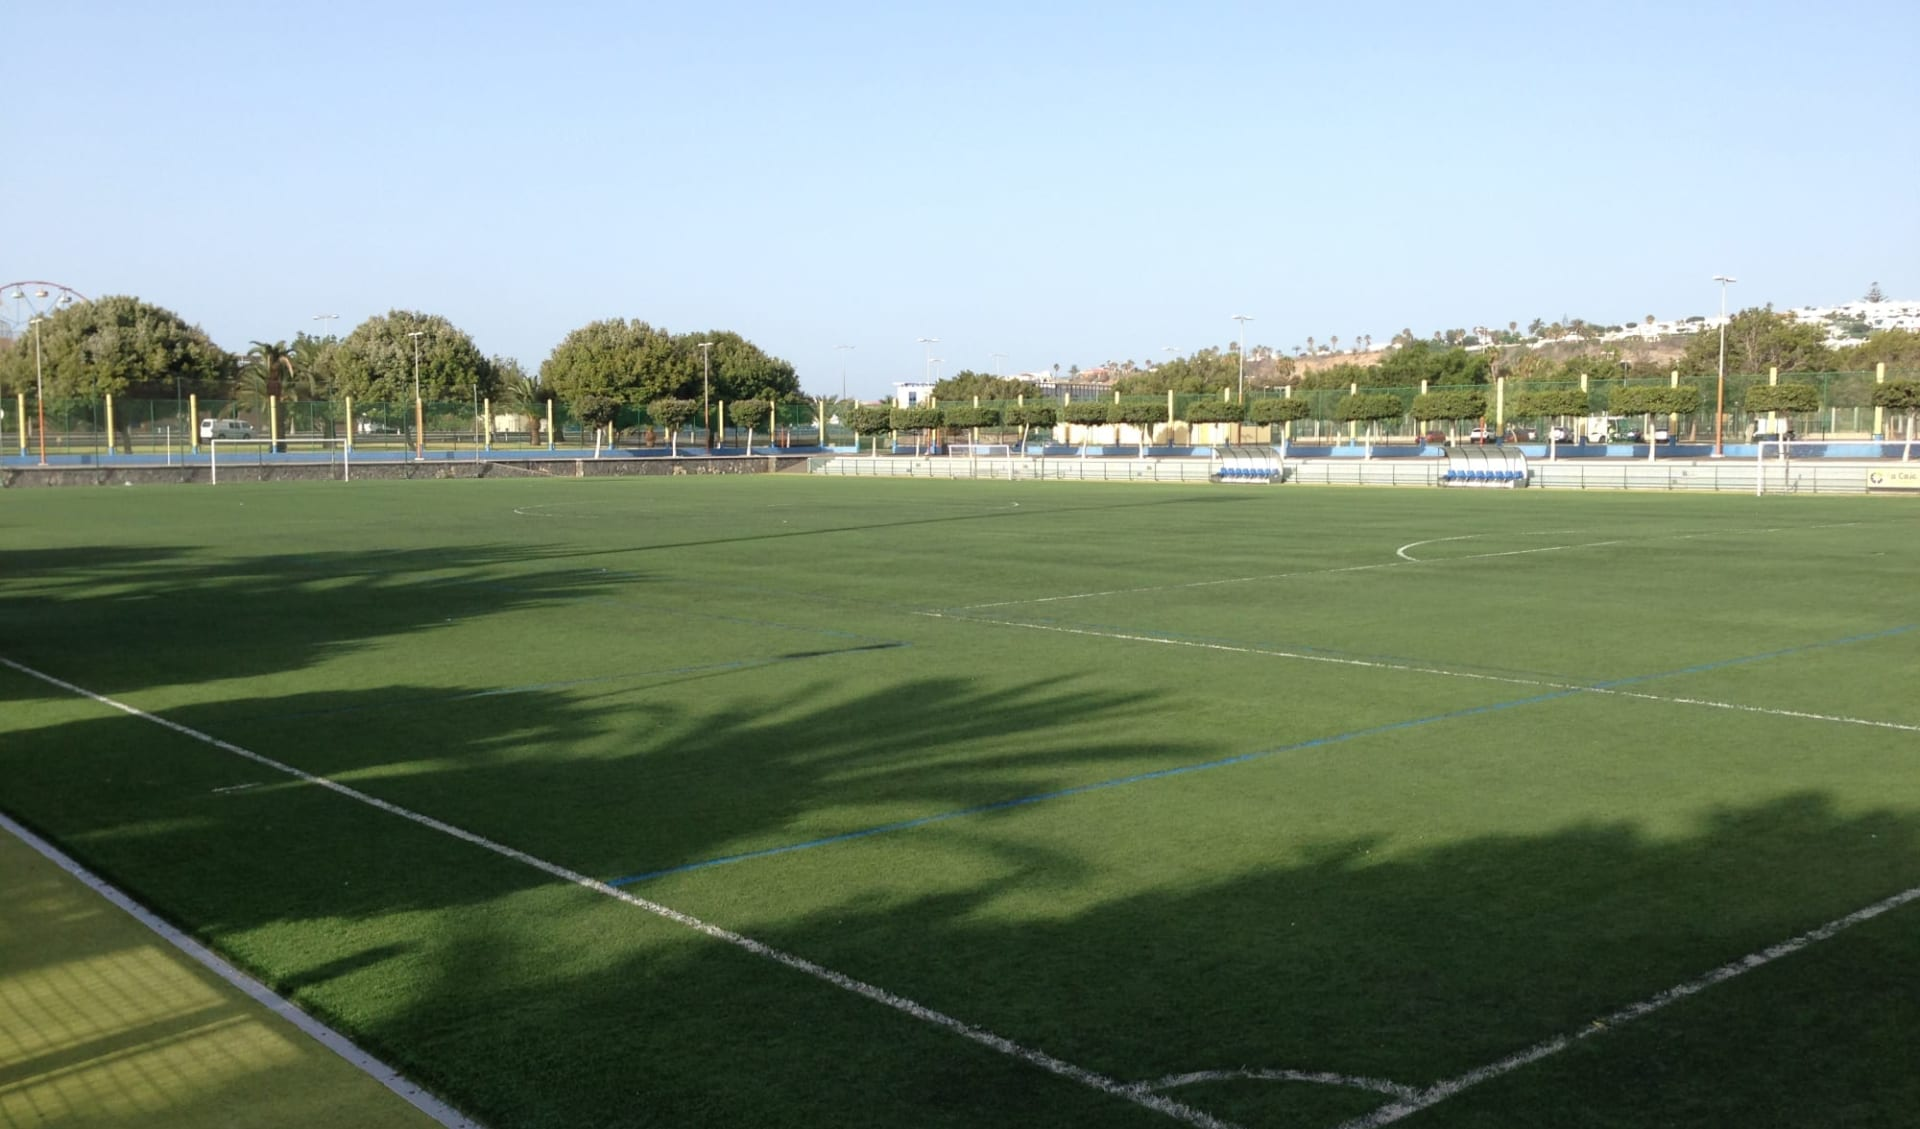 Maspalomas - Appartements Turbo Club ab Gran Canaria: Platz